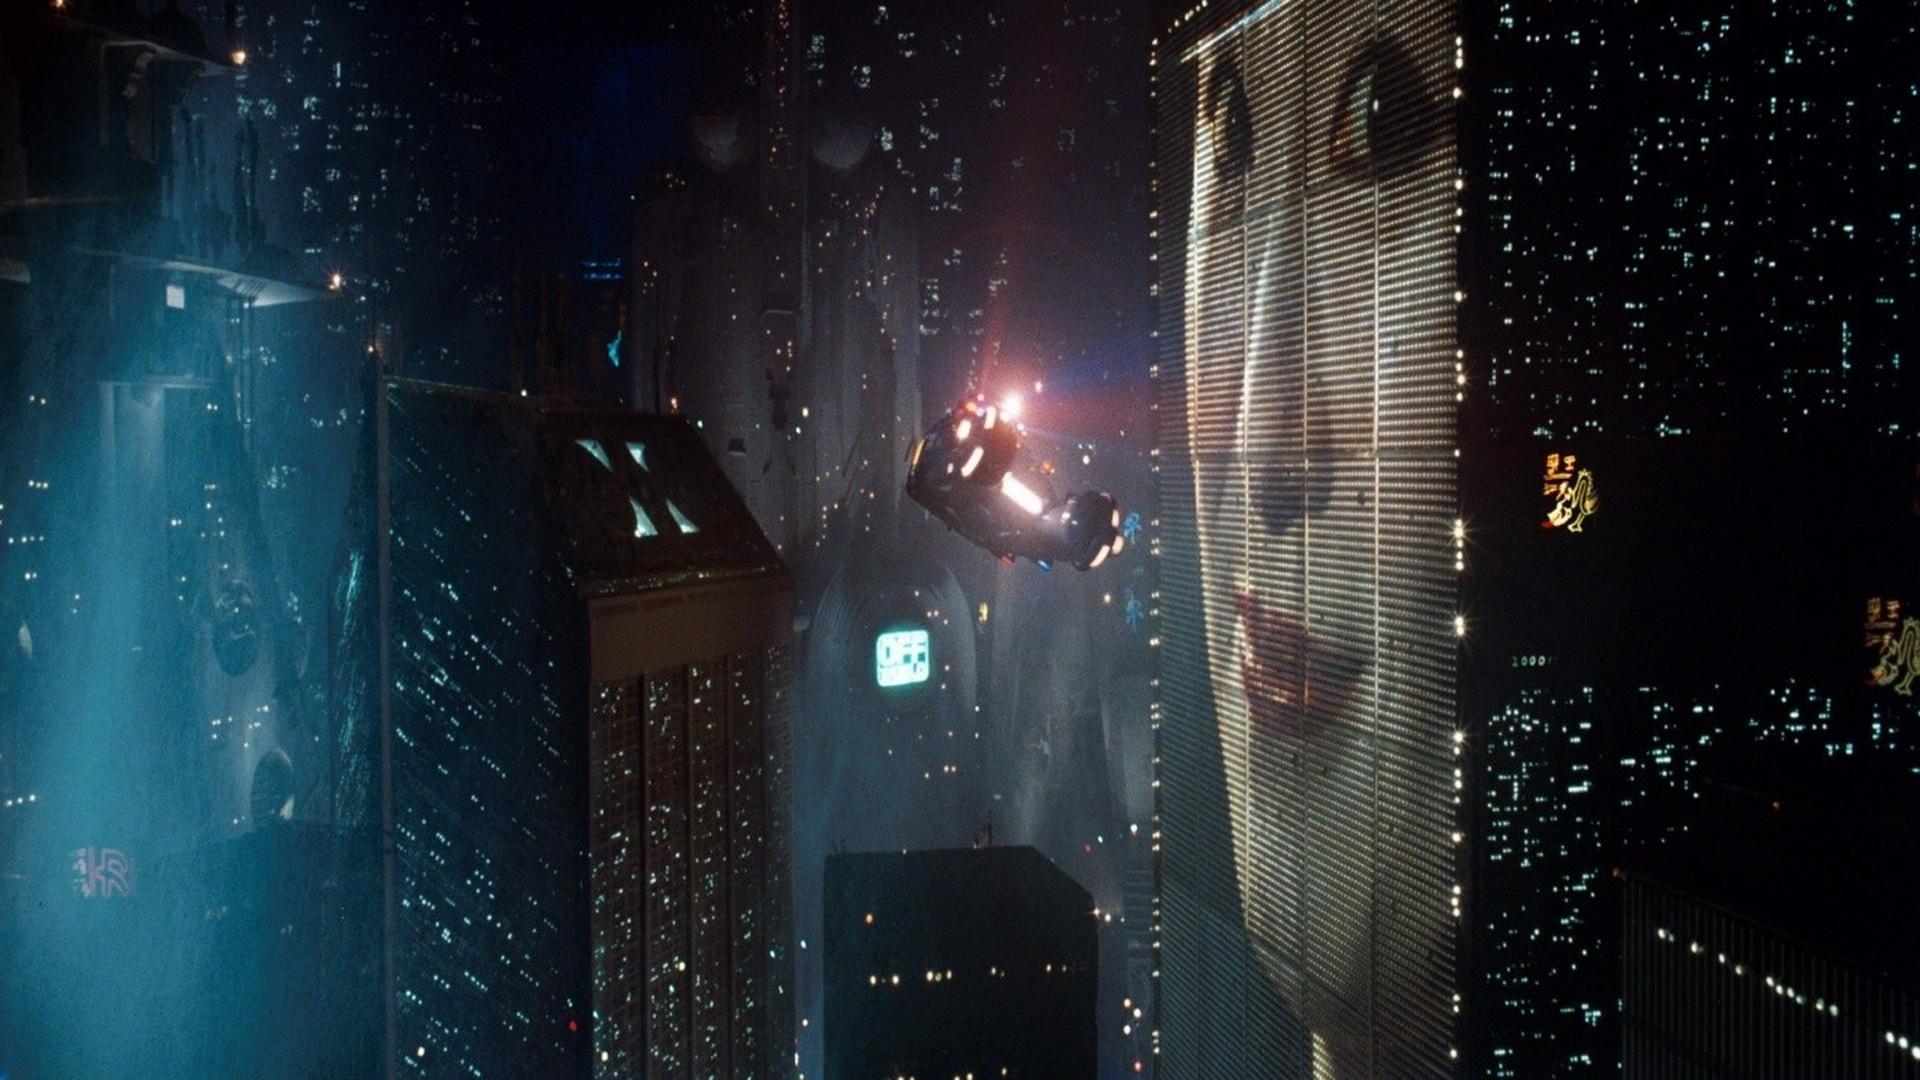 Blade Runner Wallpapers HD Wallpapers Photo 1920x1080